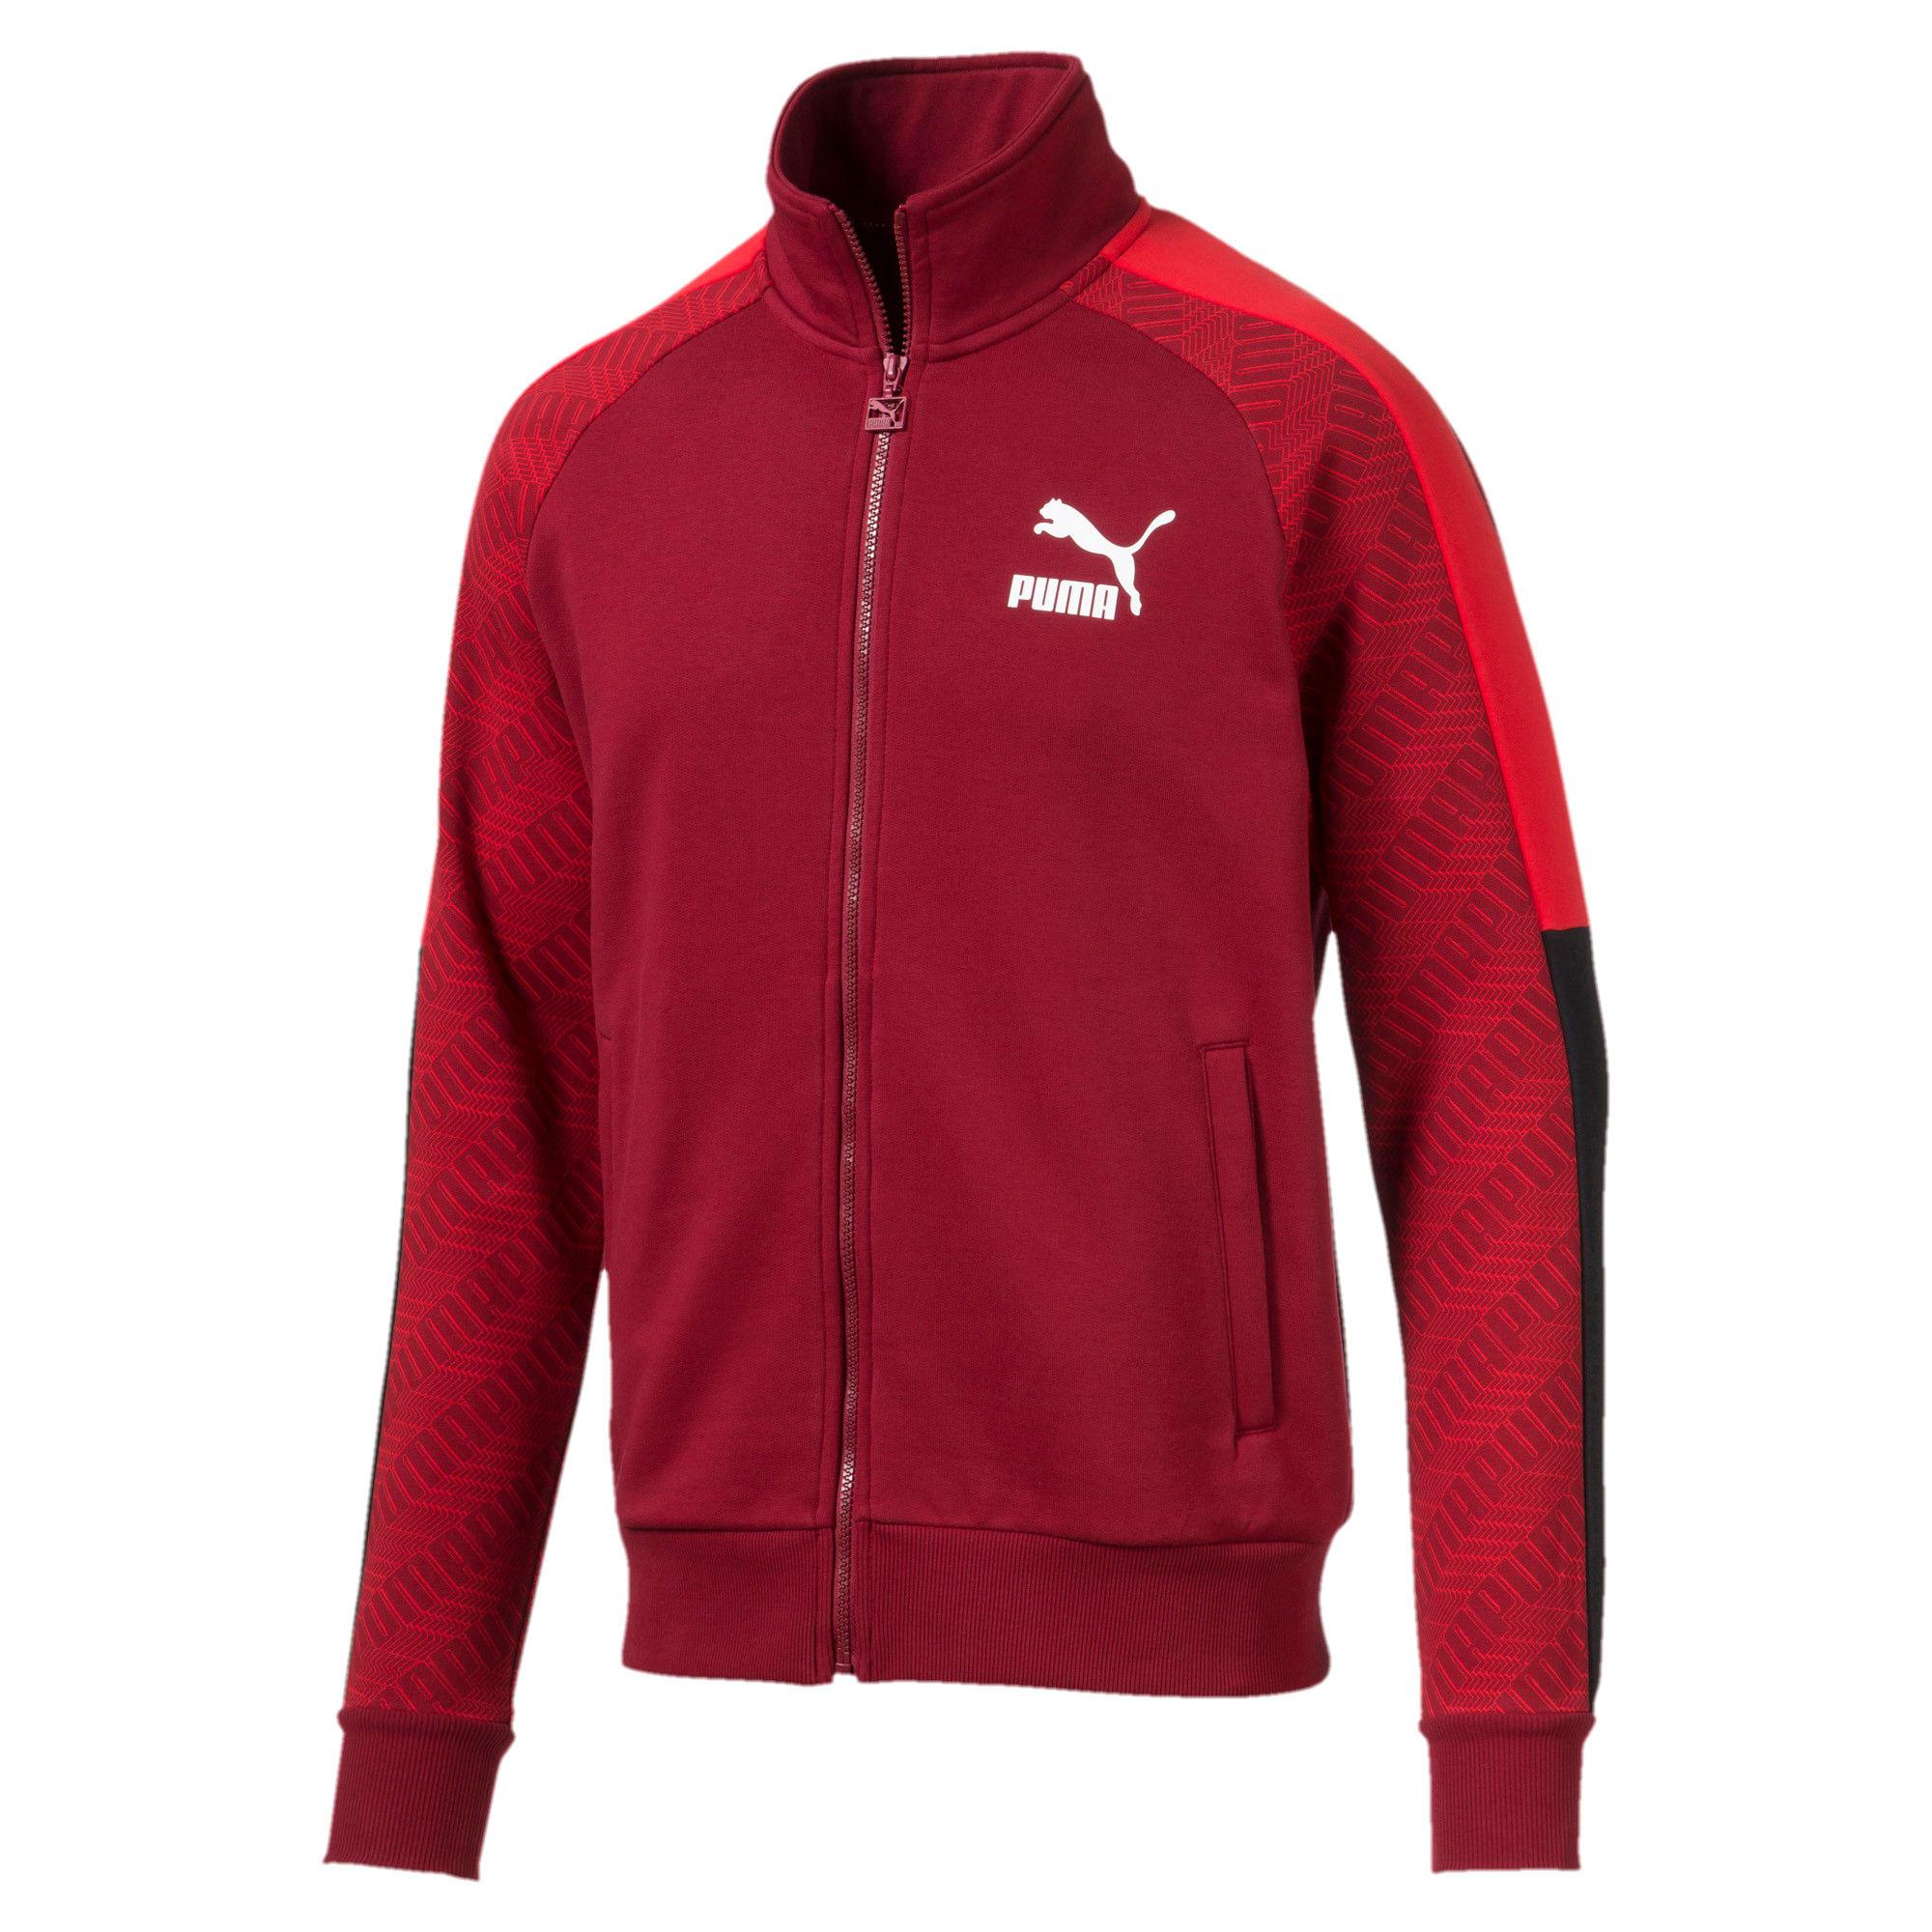 Thumbnail 1 of T7 Men's AOP Track Jacket, Rhubarb-Repeat logo, medium